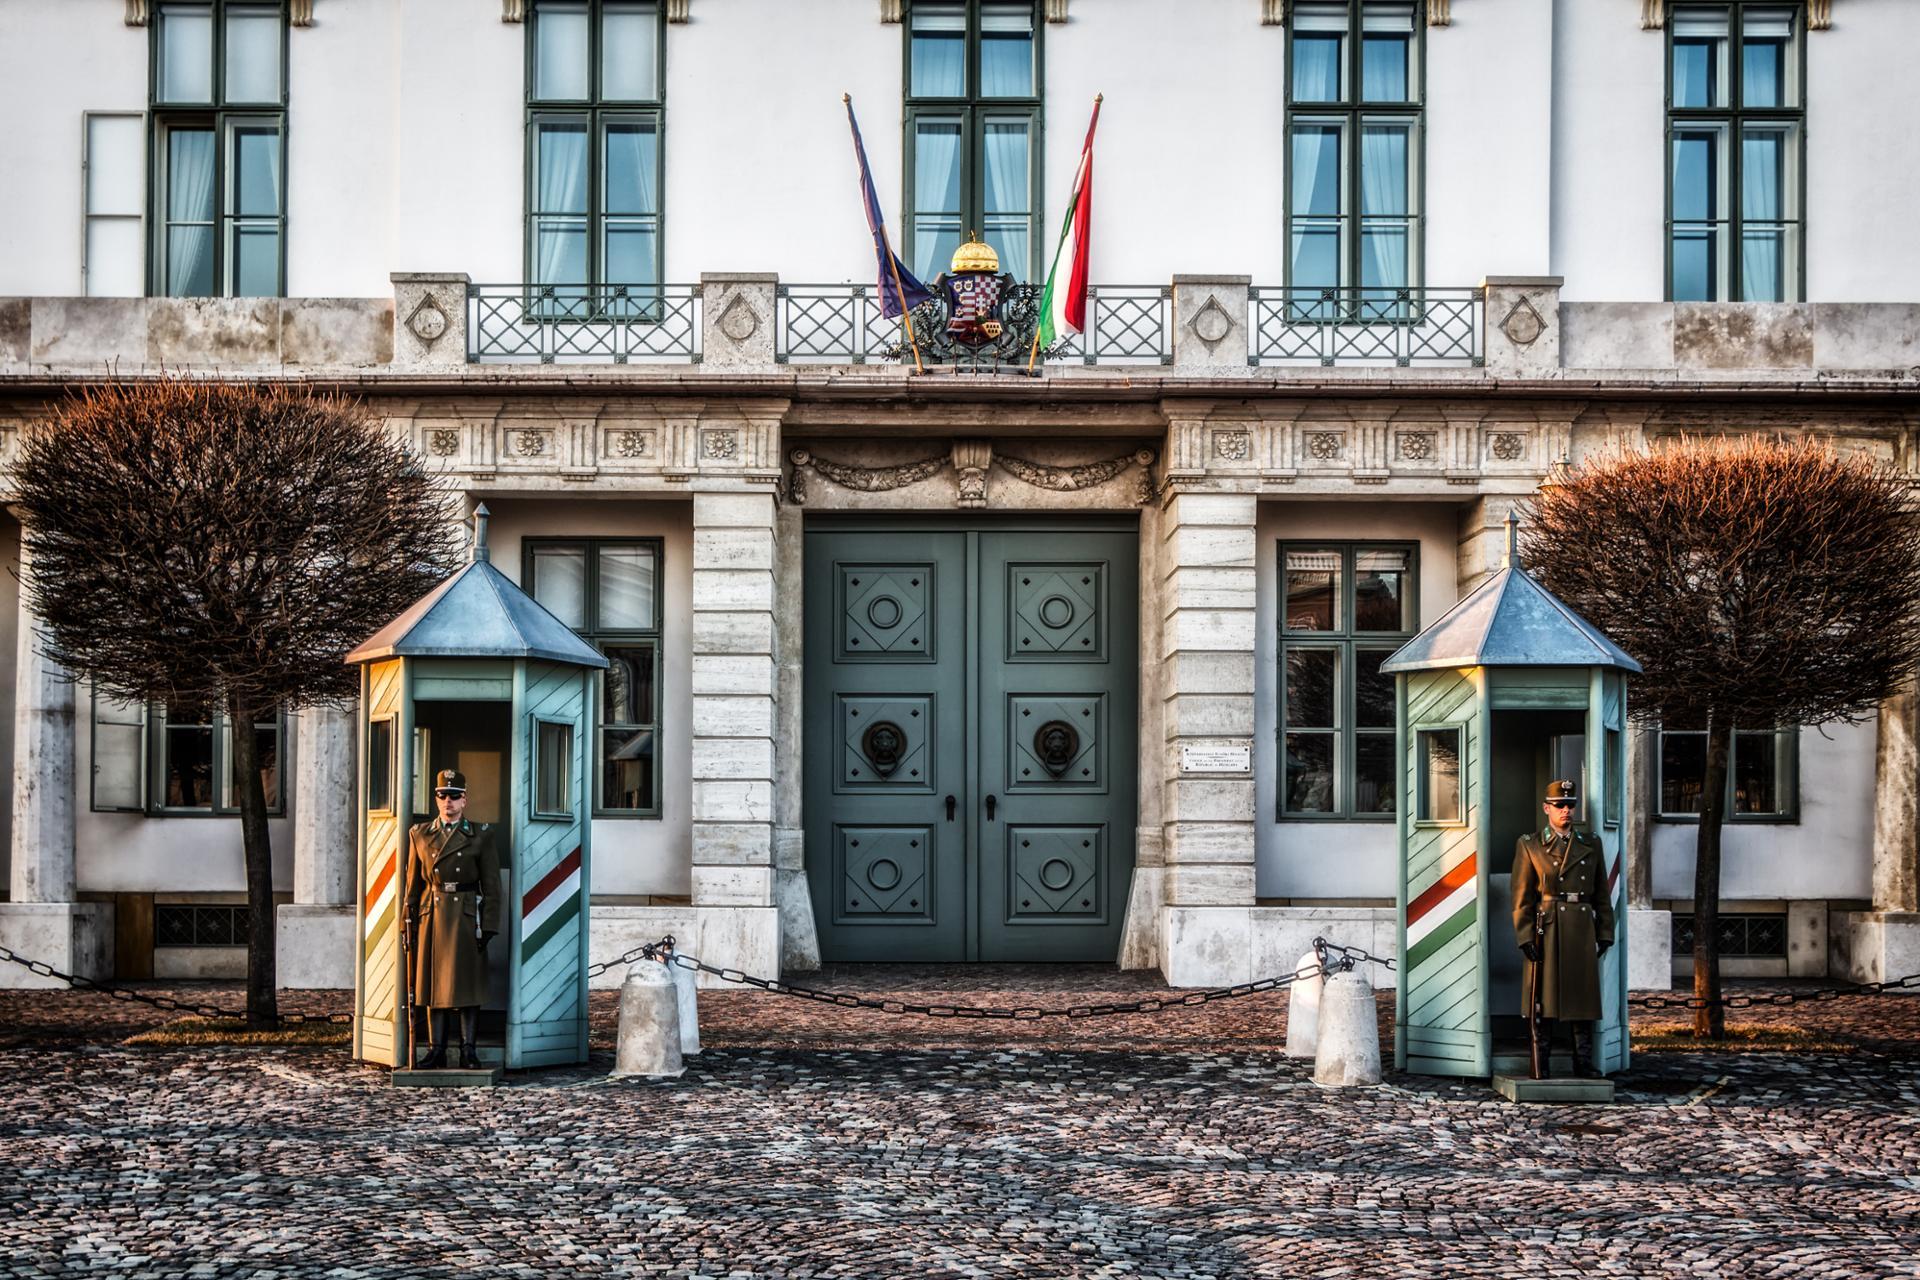 Budapest Palais Sándor : Résidence officielle du président